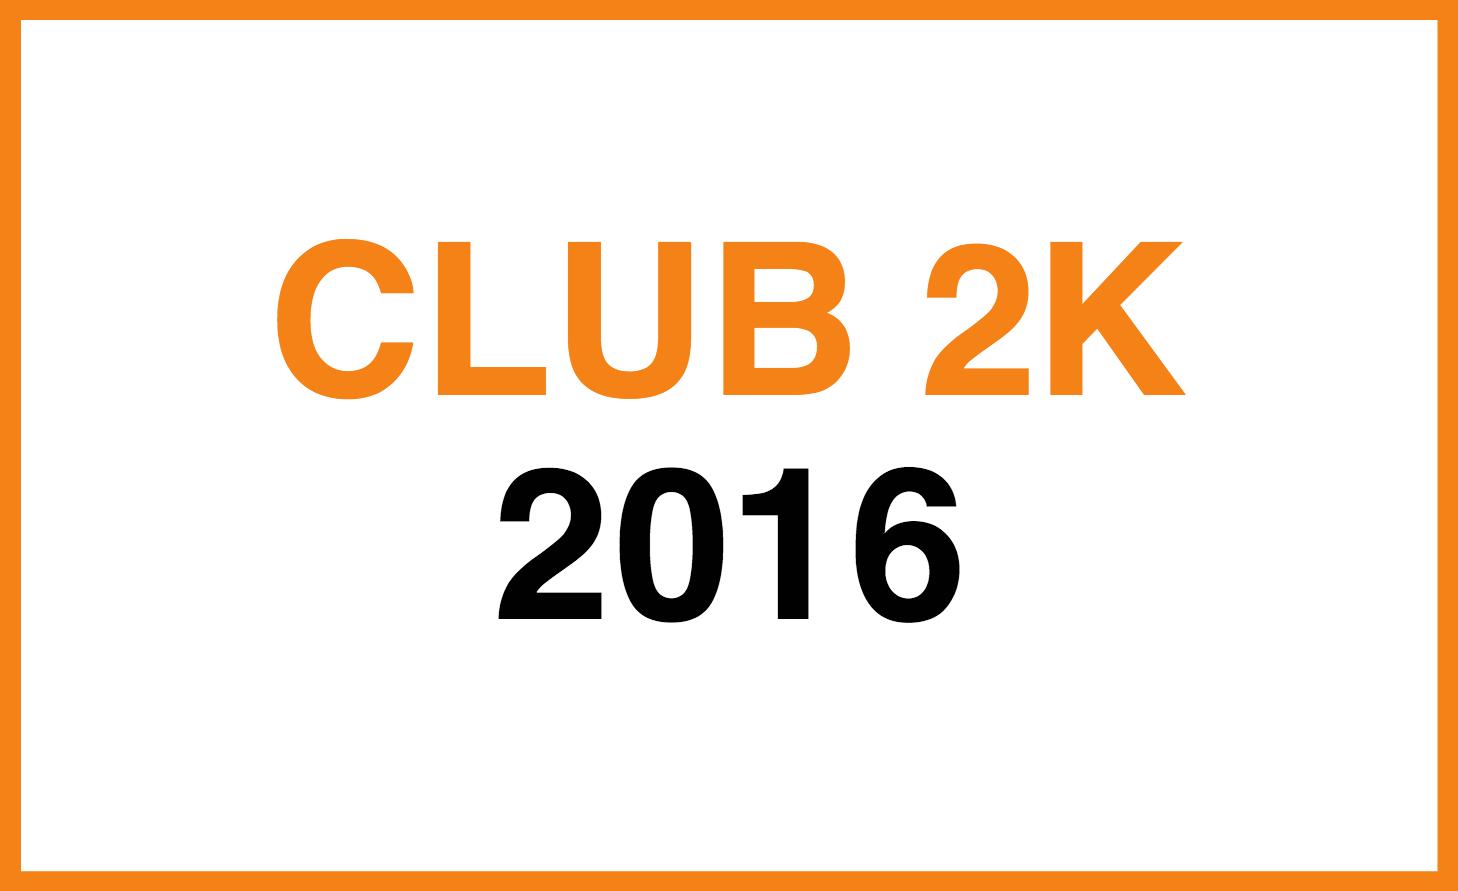 Club_2K_2016.png